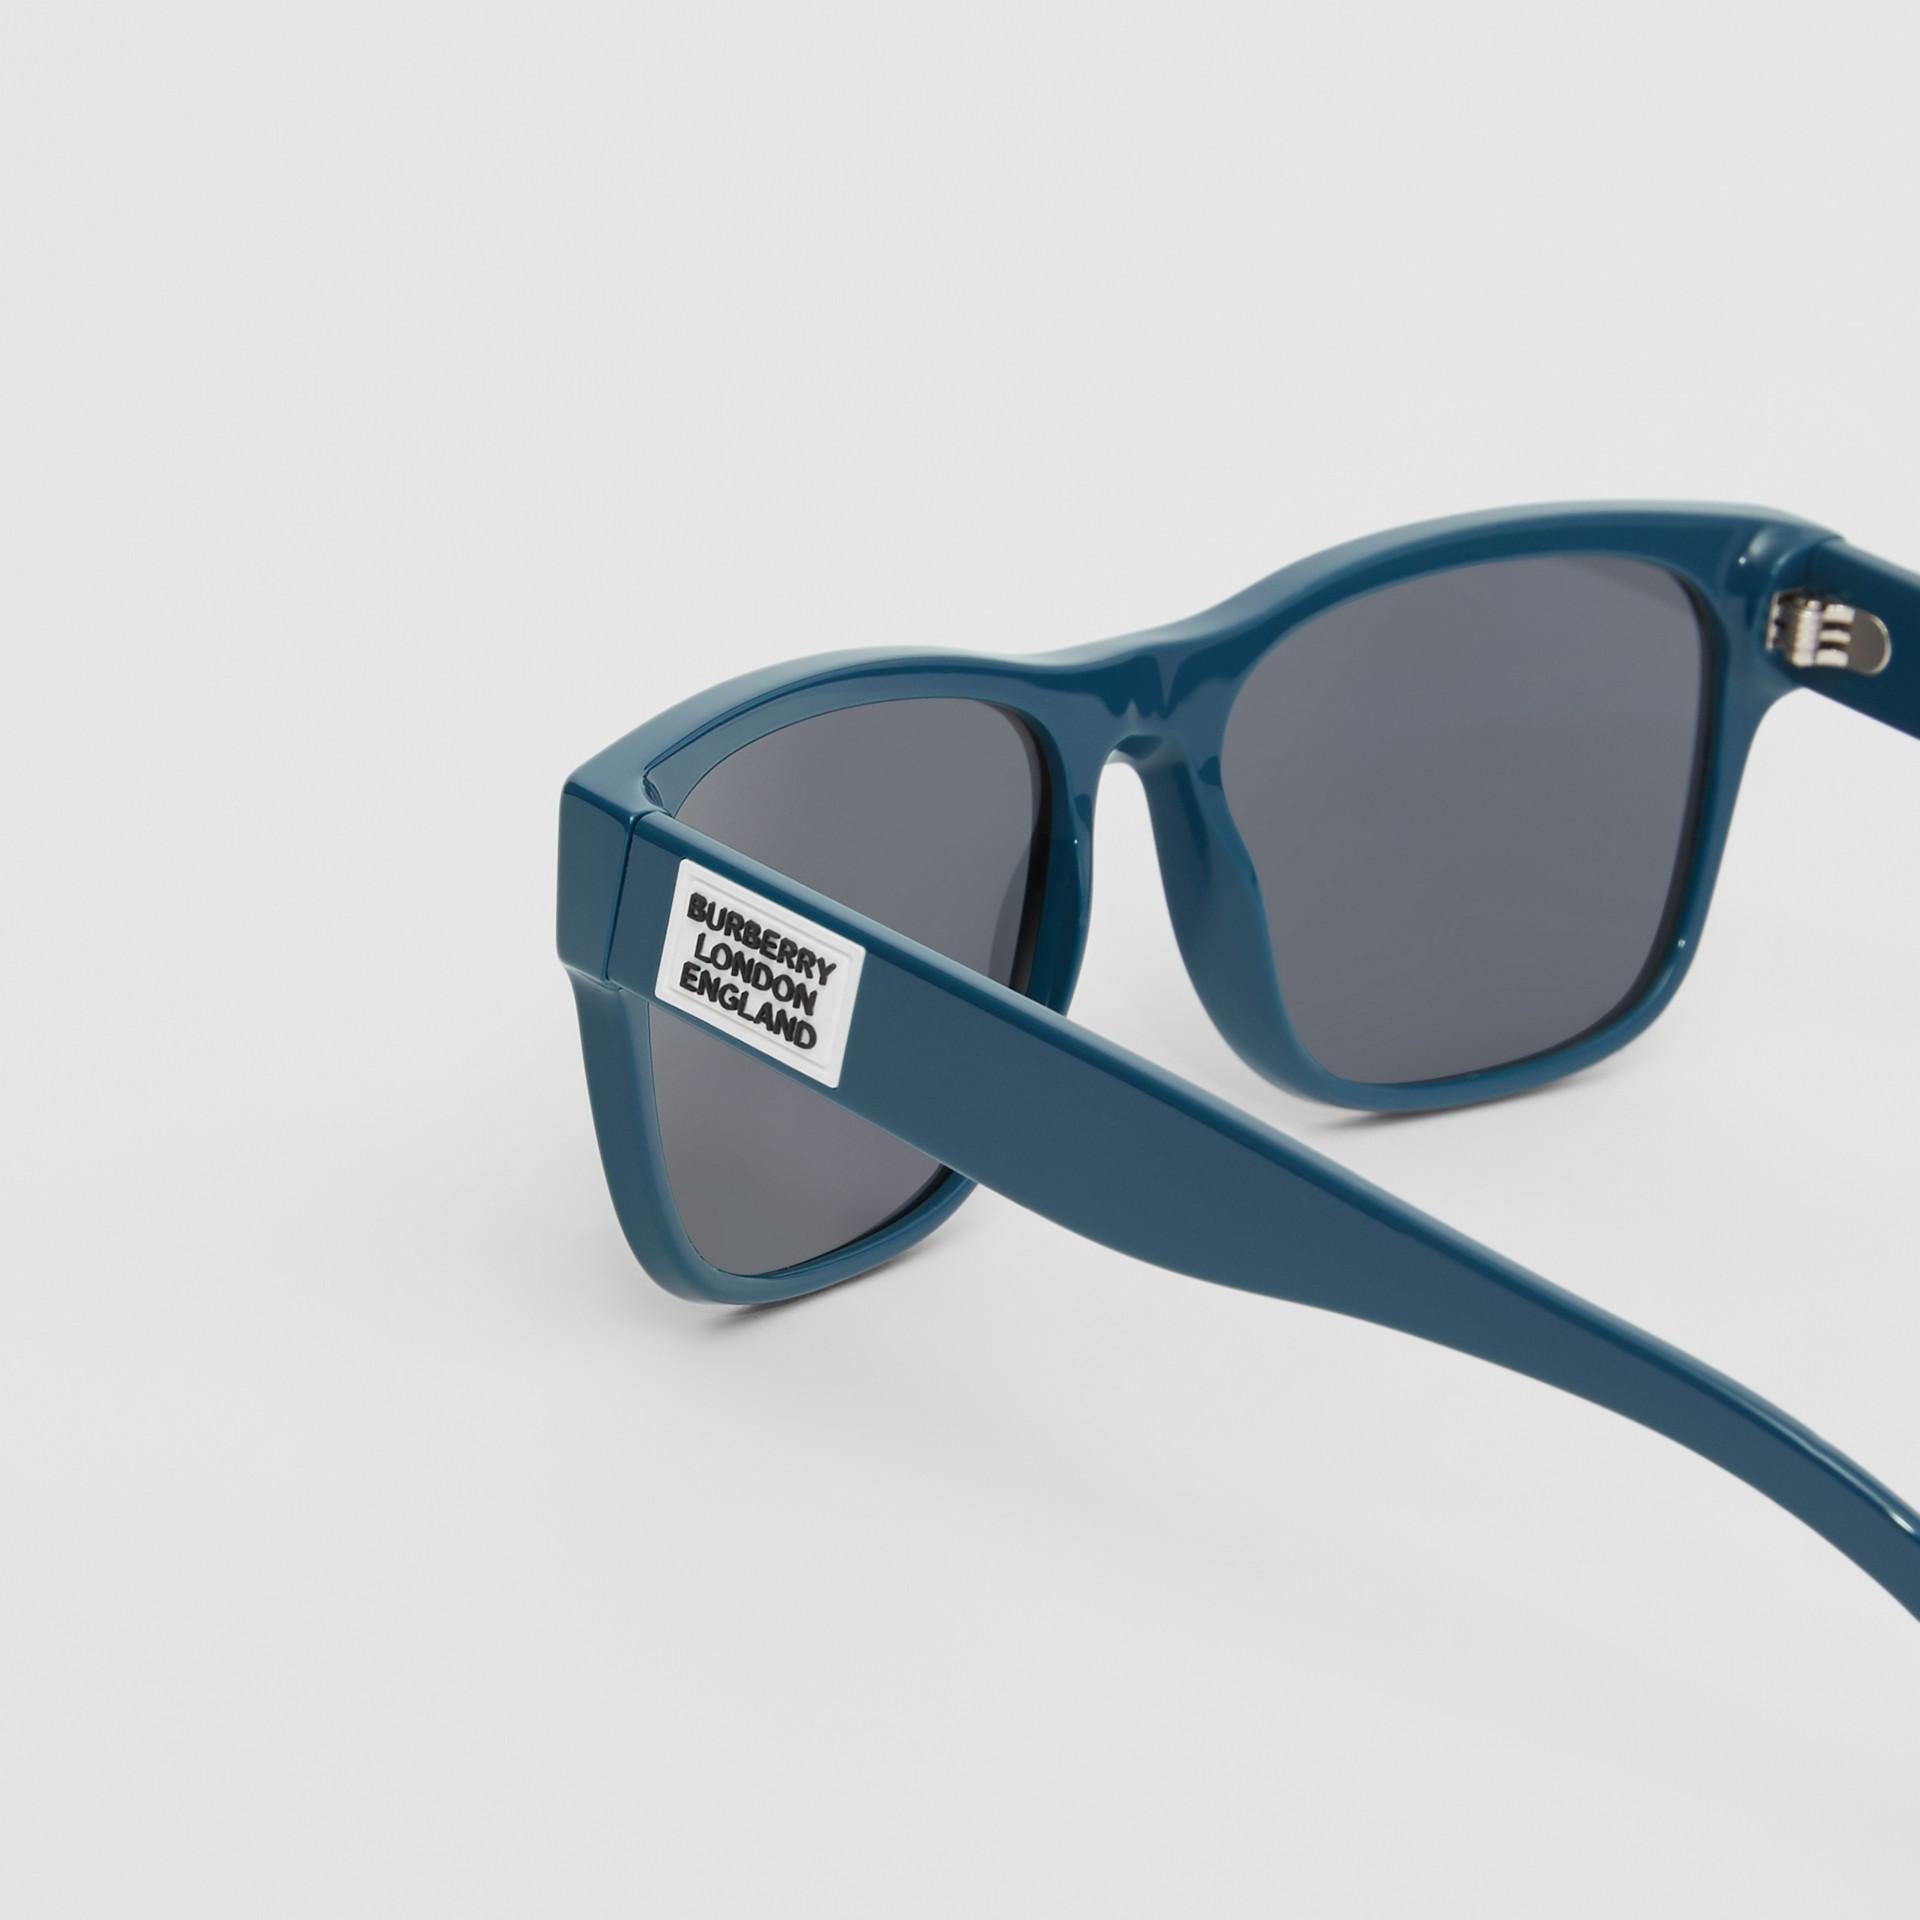 Logo Appliqué Square Frame Sunglasses in Deep Blue - Men | Burberry - gallery image 1